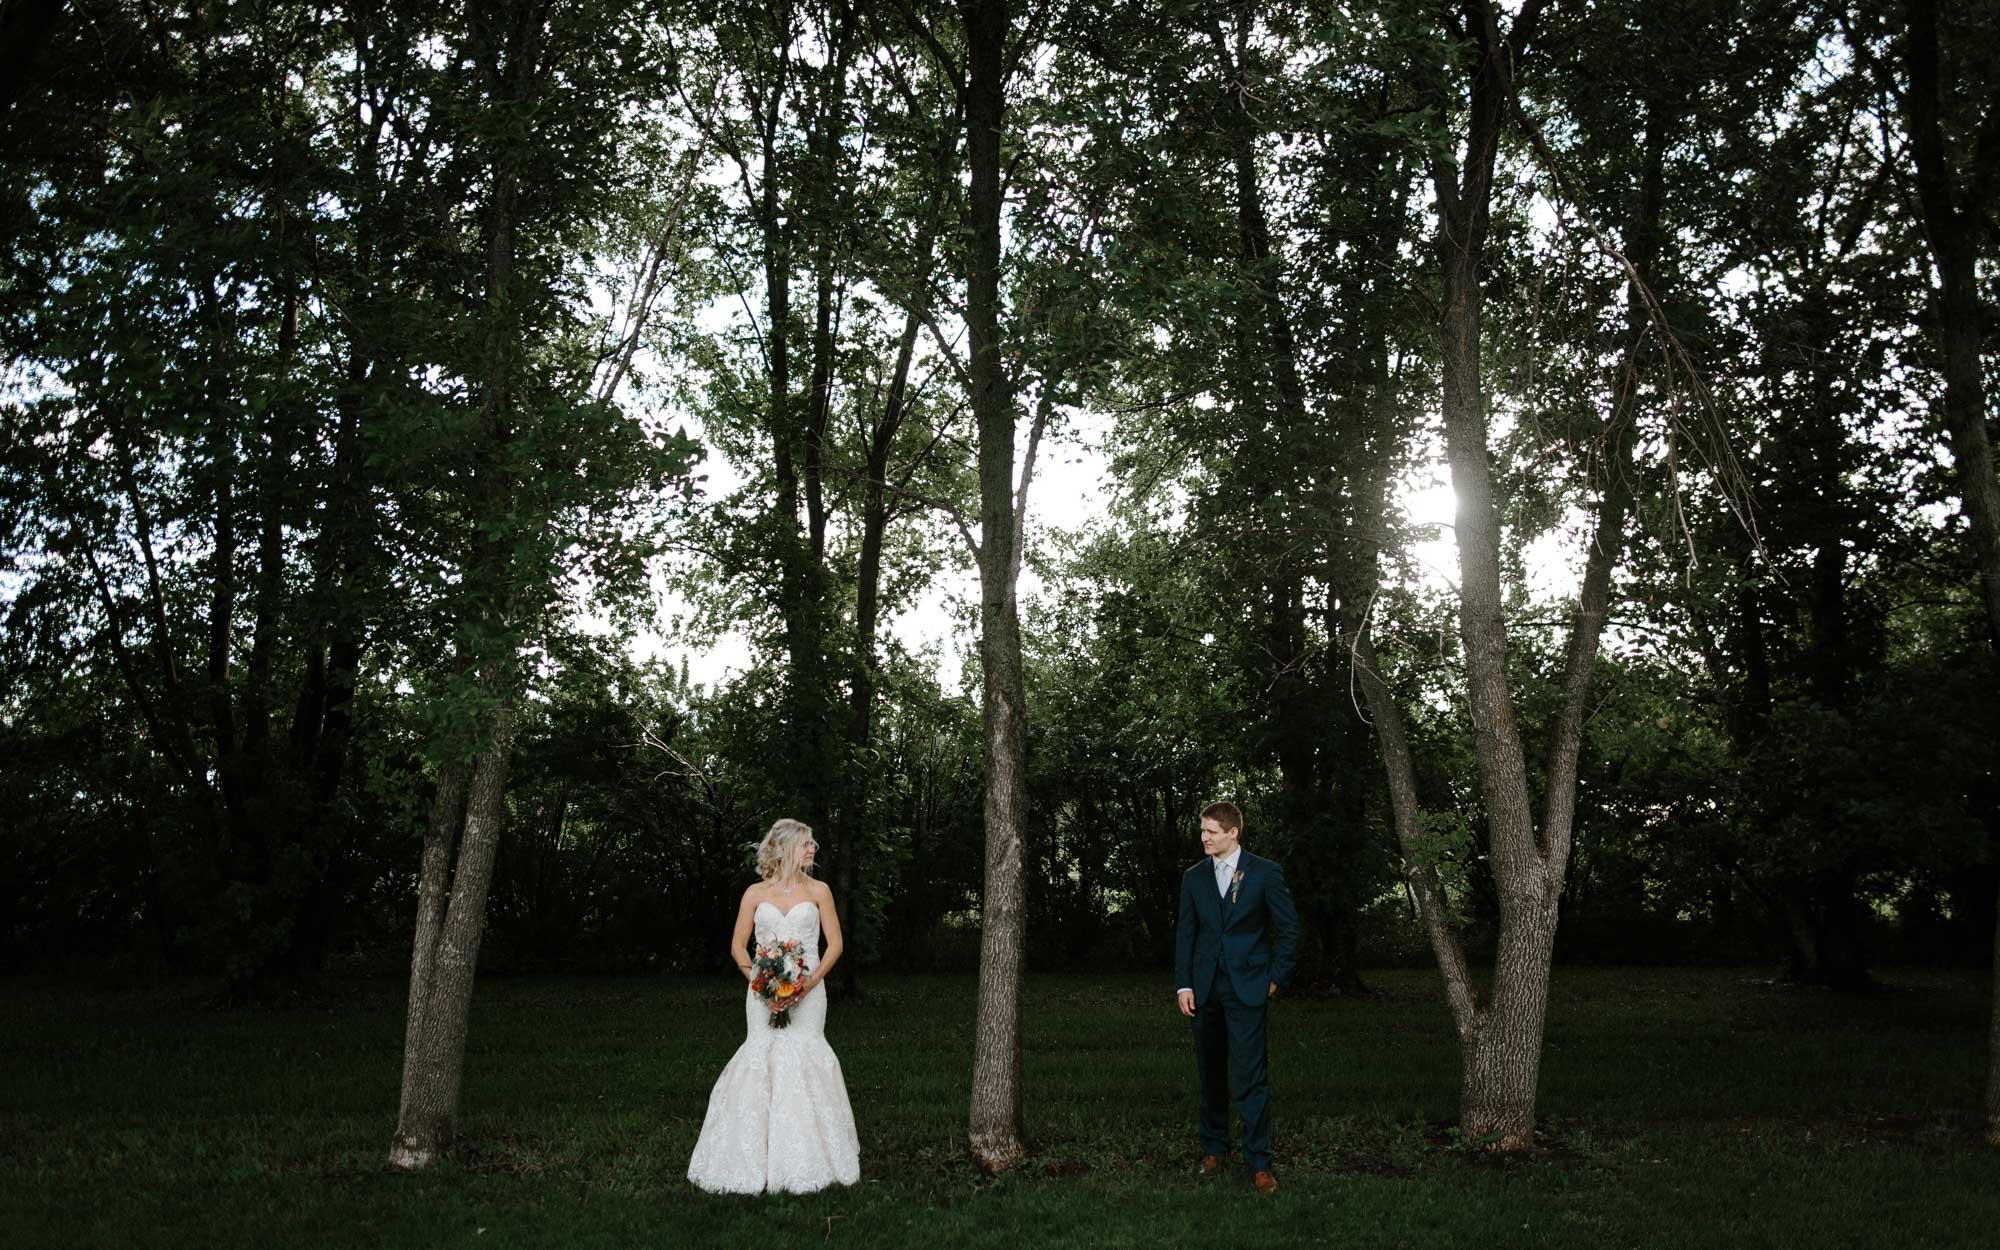 meadow-barn-wedding-sioux-falls-south-dakota-romantic-adventerous-michael-liedtke-photography085.jpg